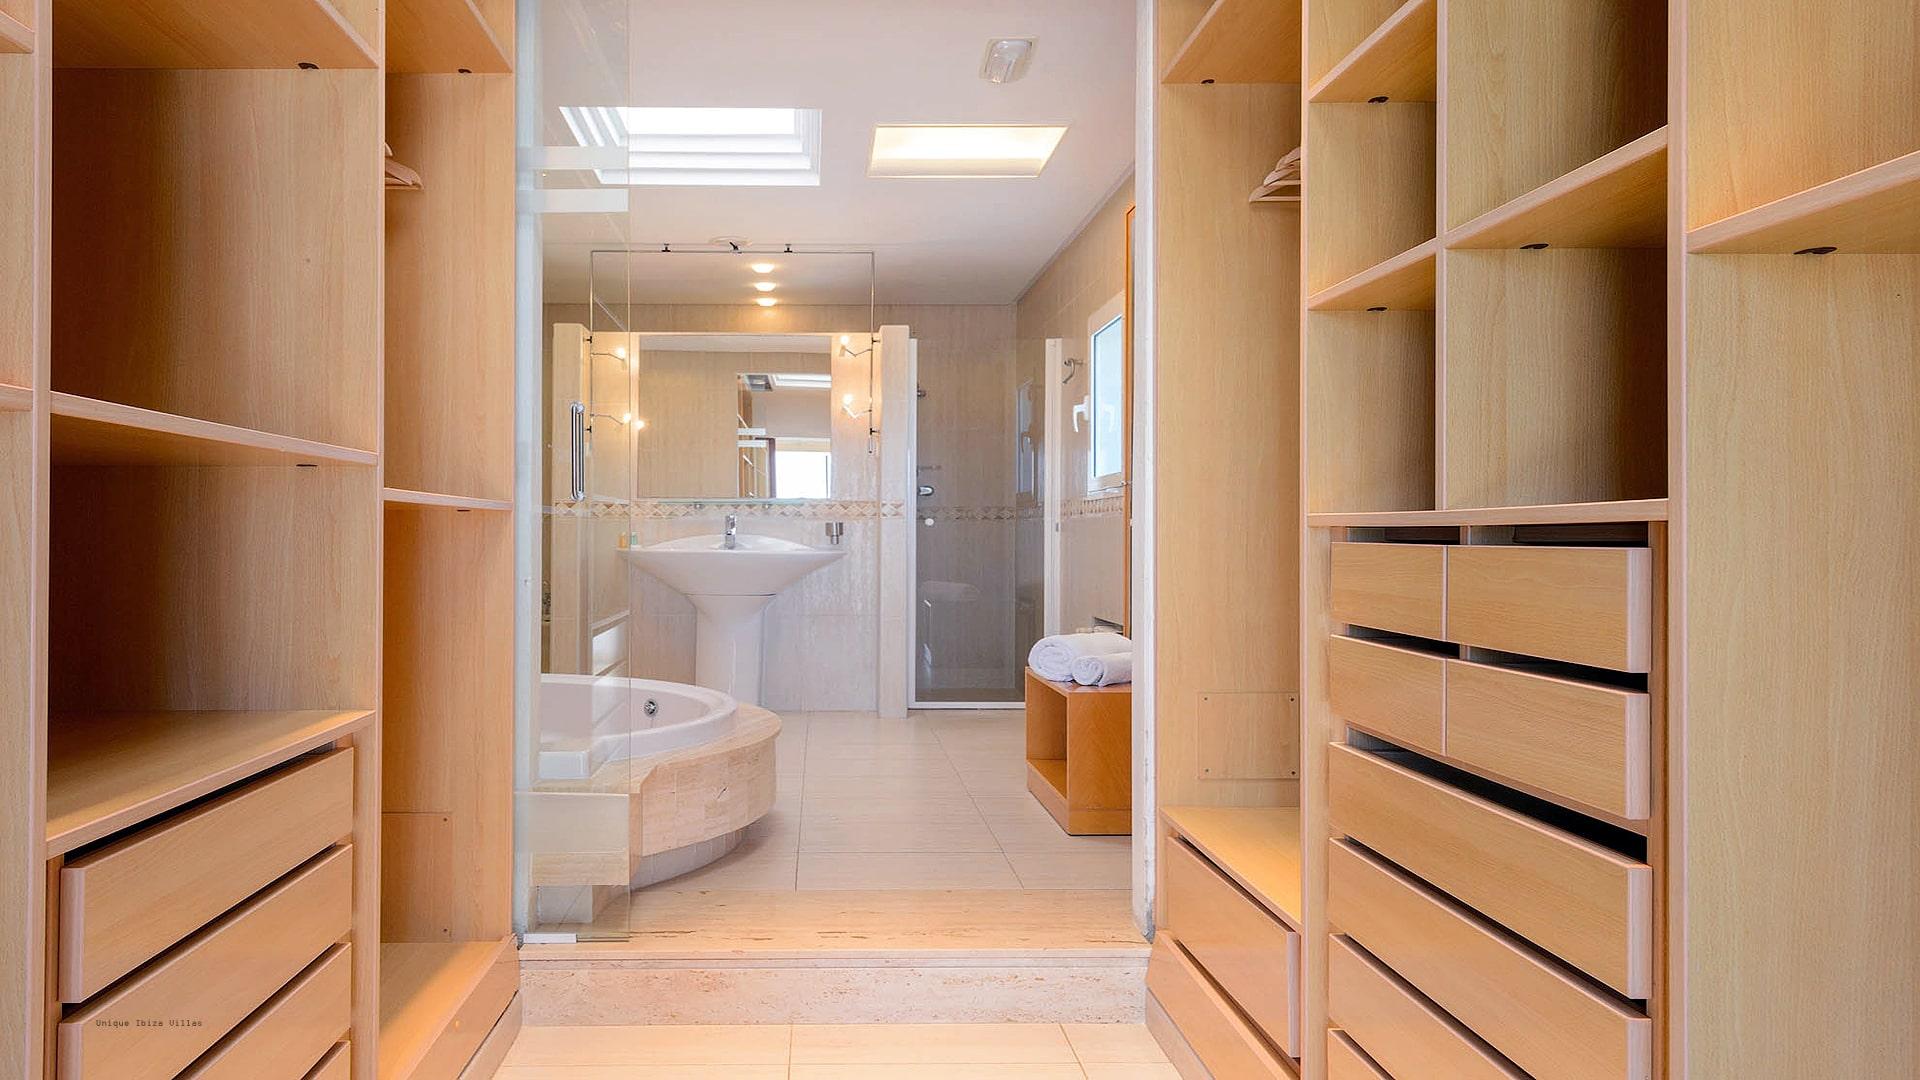 Villa Can Fluxa Ibiza 34 Bedroom 1